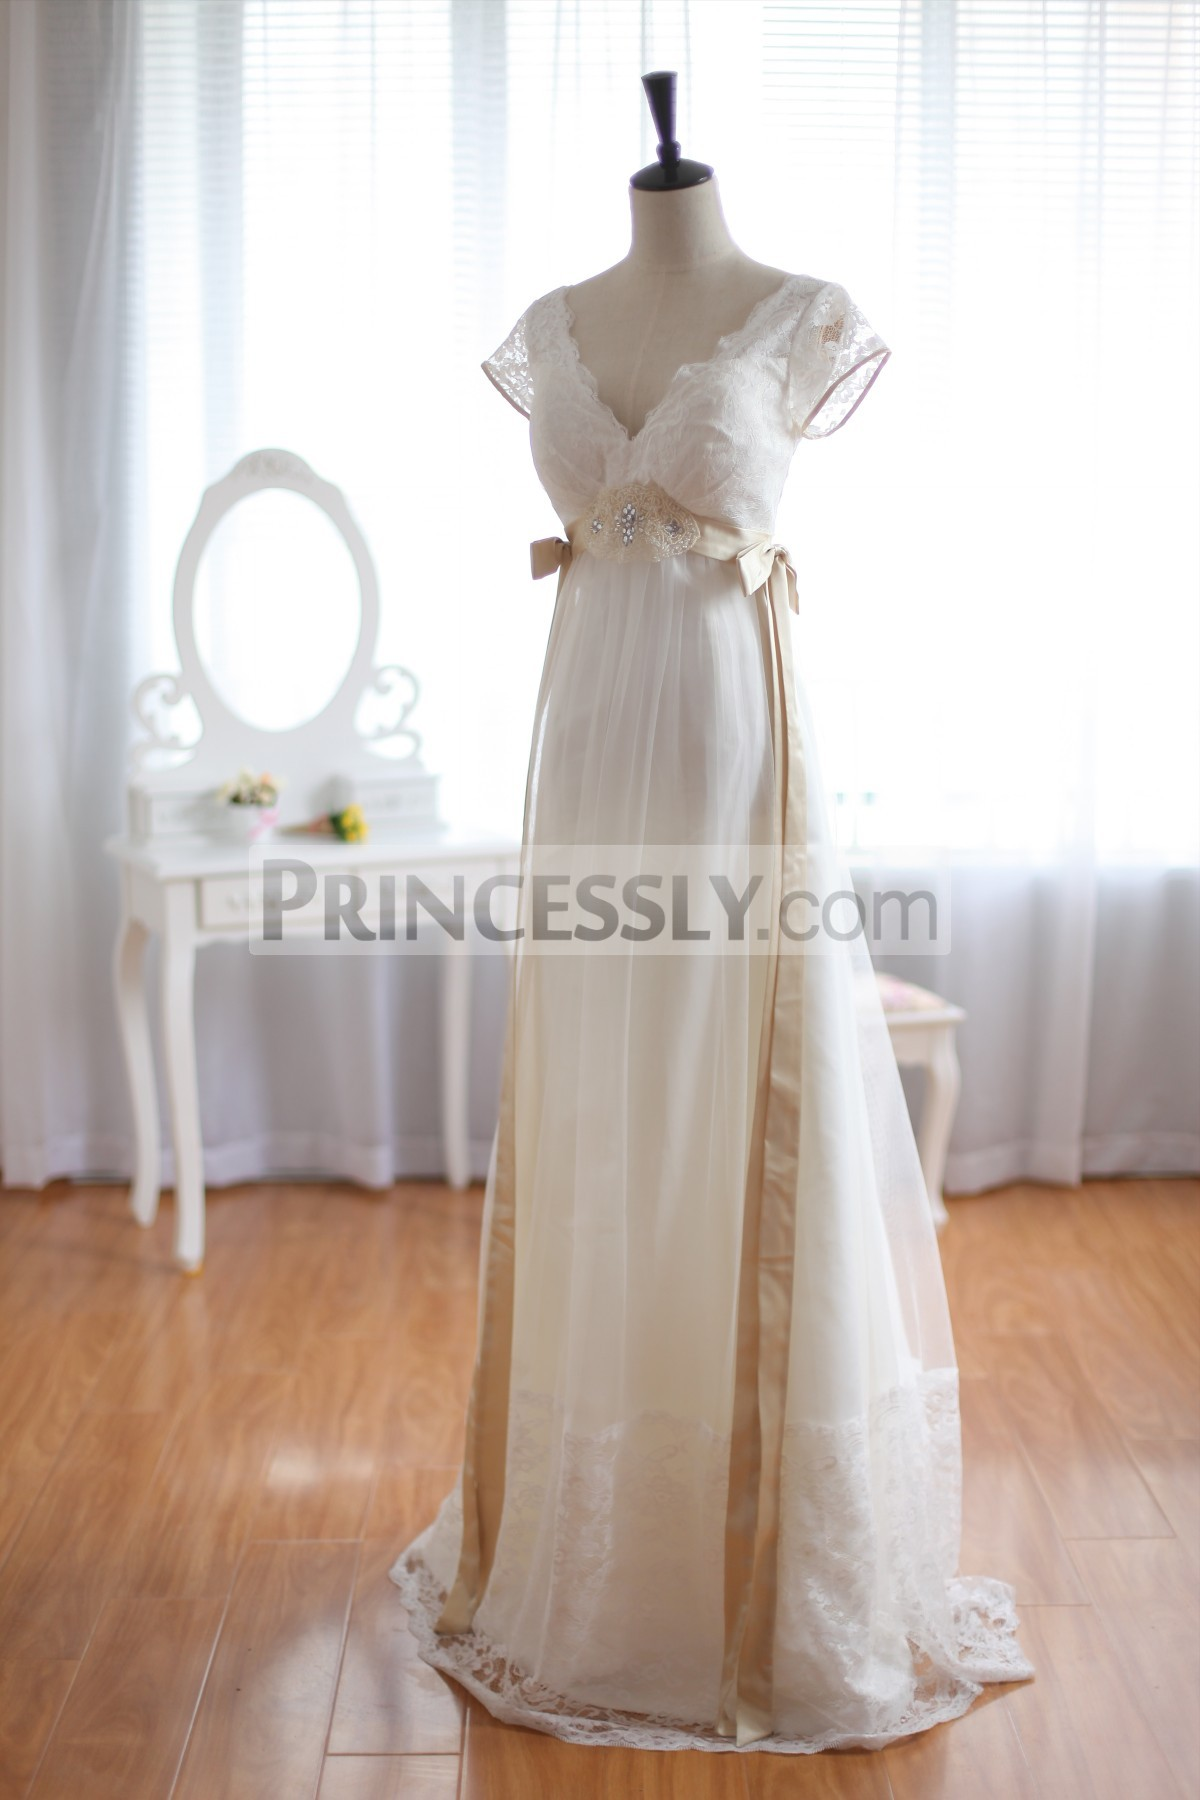 Princessly.com-K1001931-Vintage Inspired Lace Tulle Wedding Dress Deep V Back with Cap Sleeves Maternity Dress-33